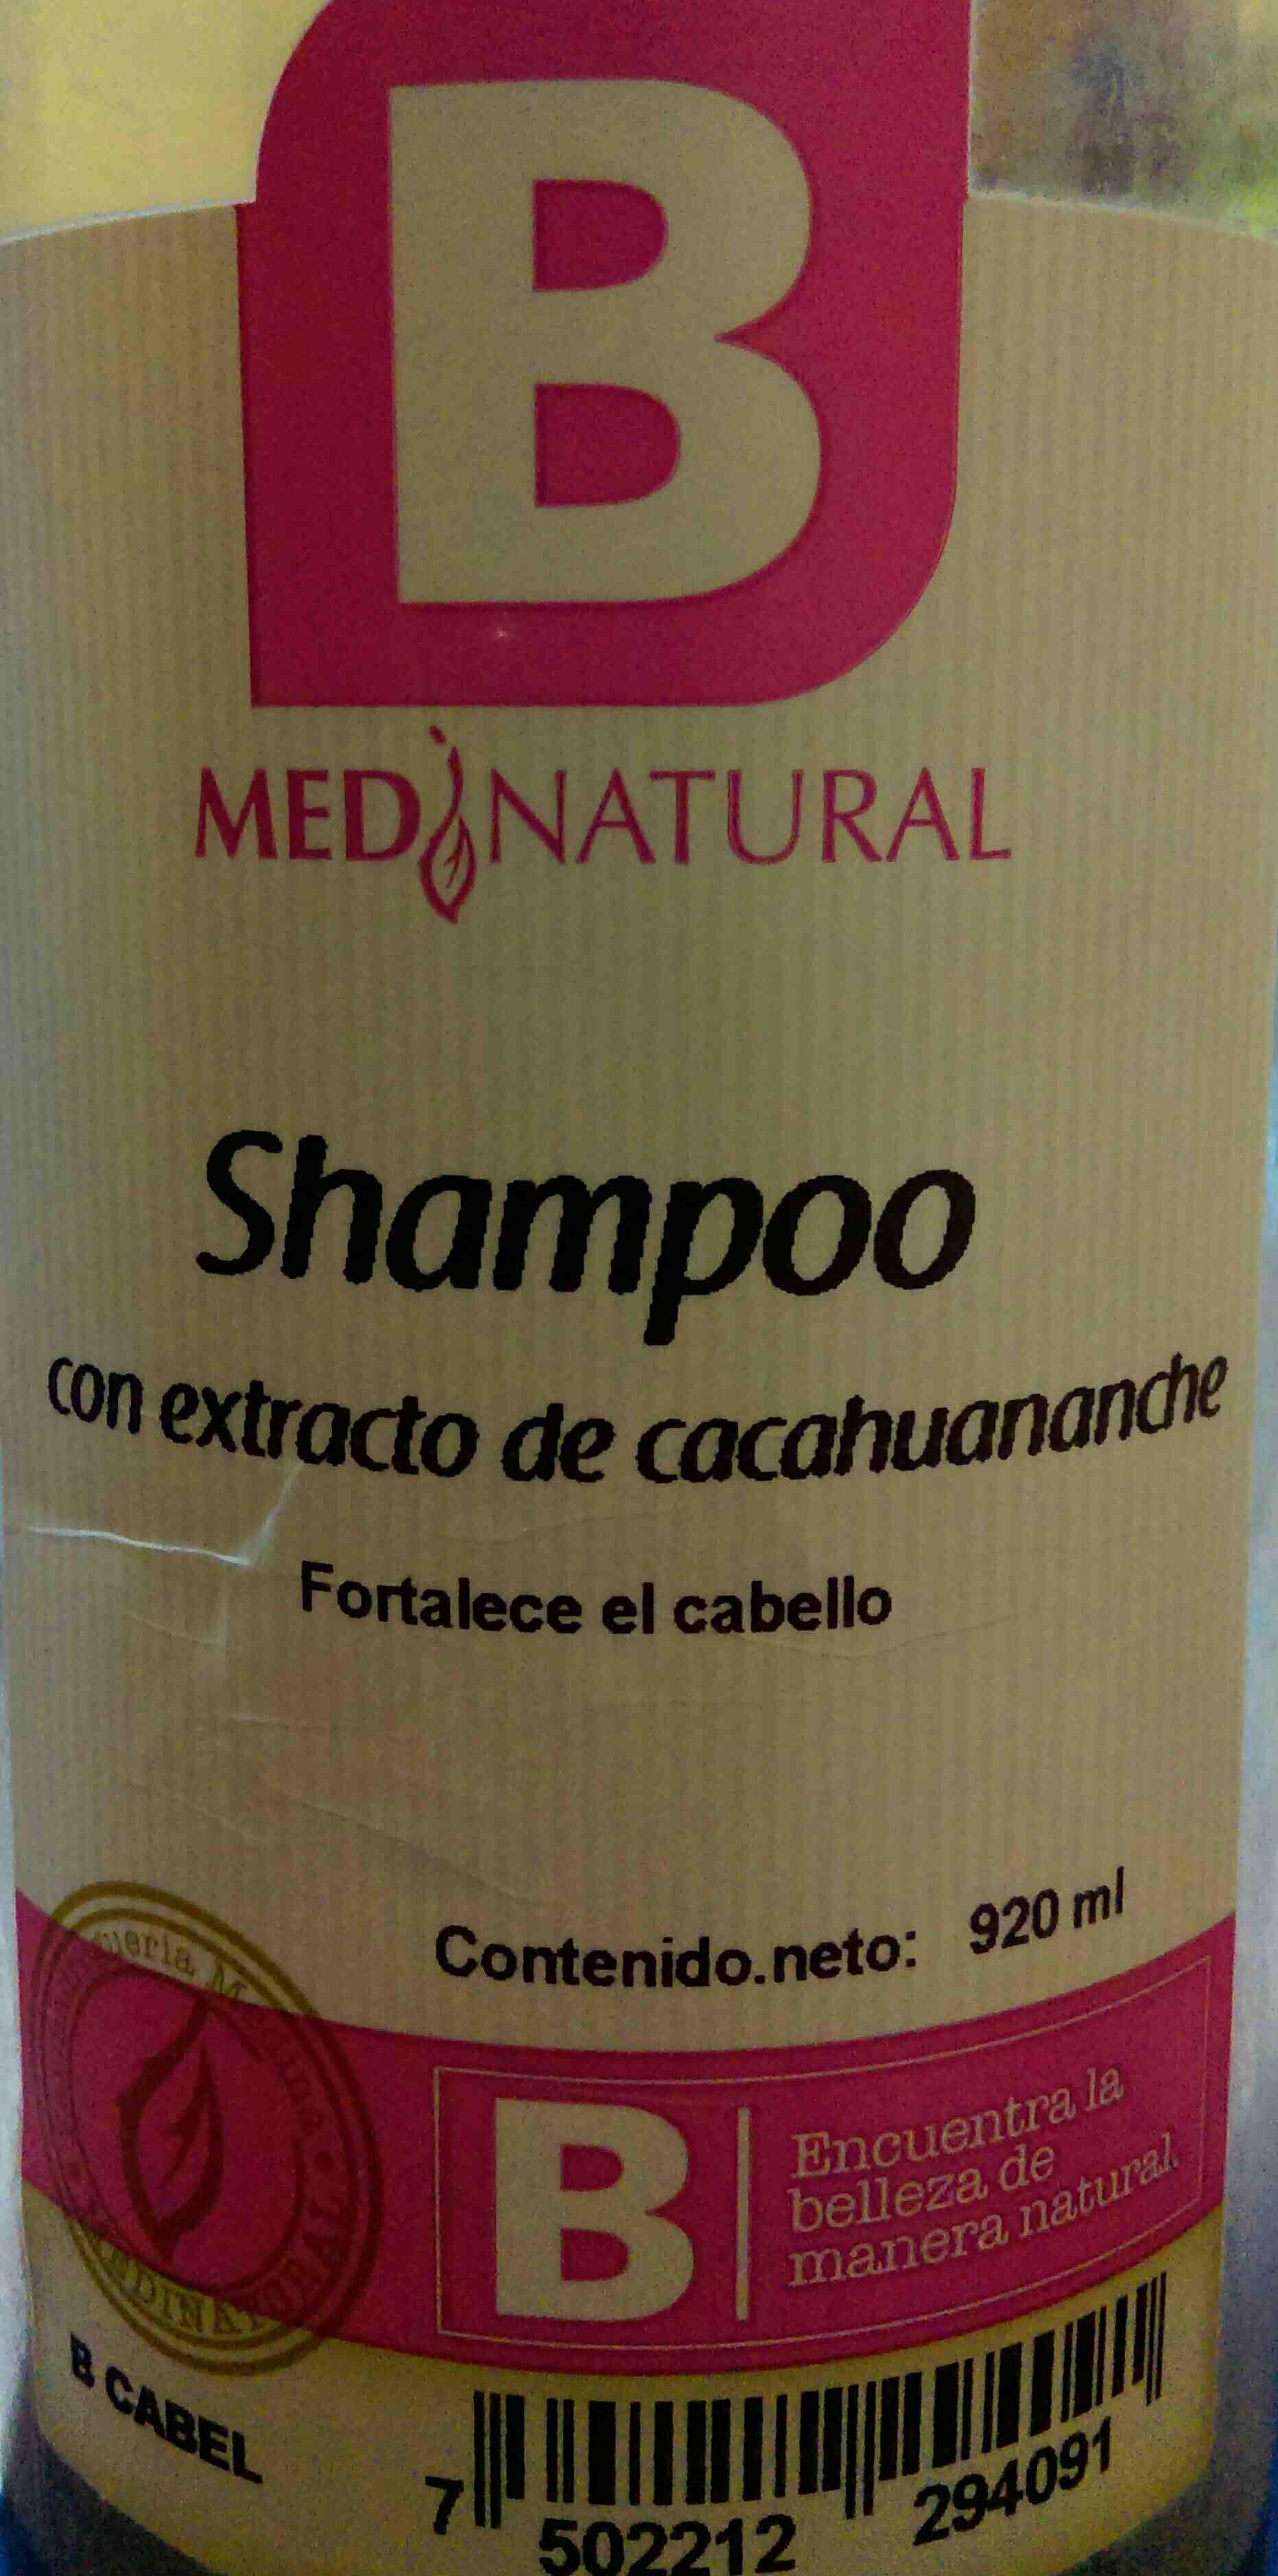 Shampoo Medina - Product - en